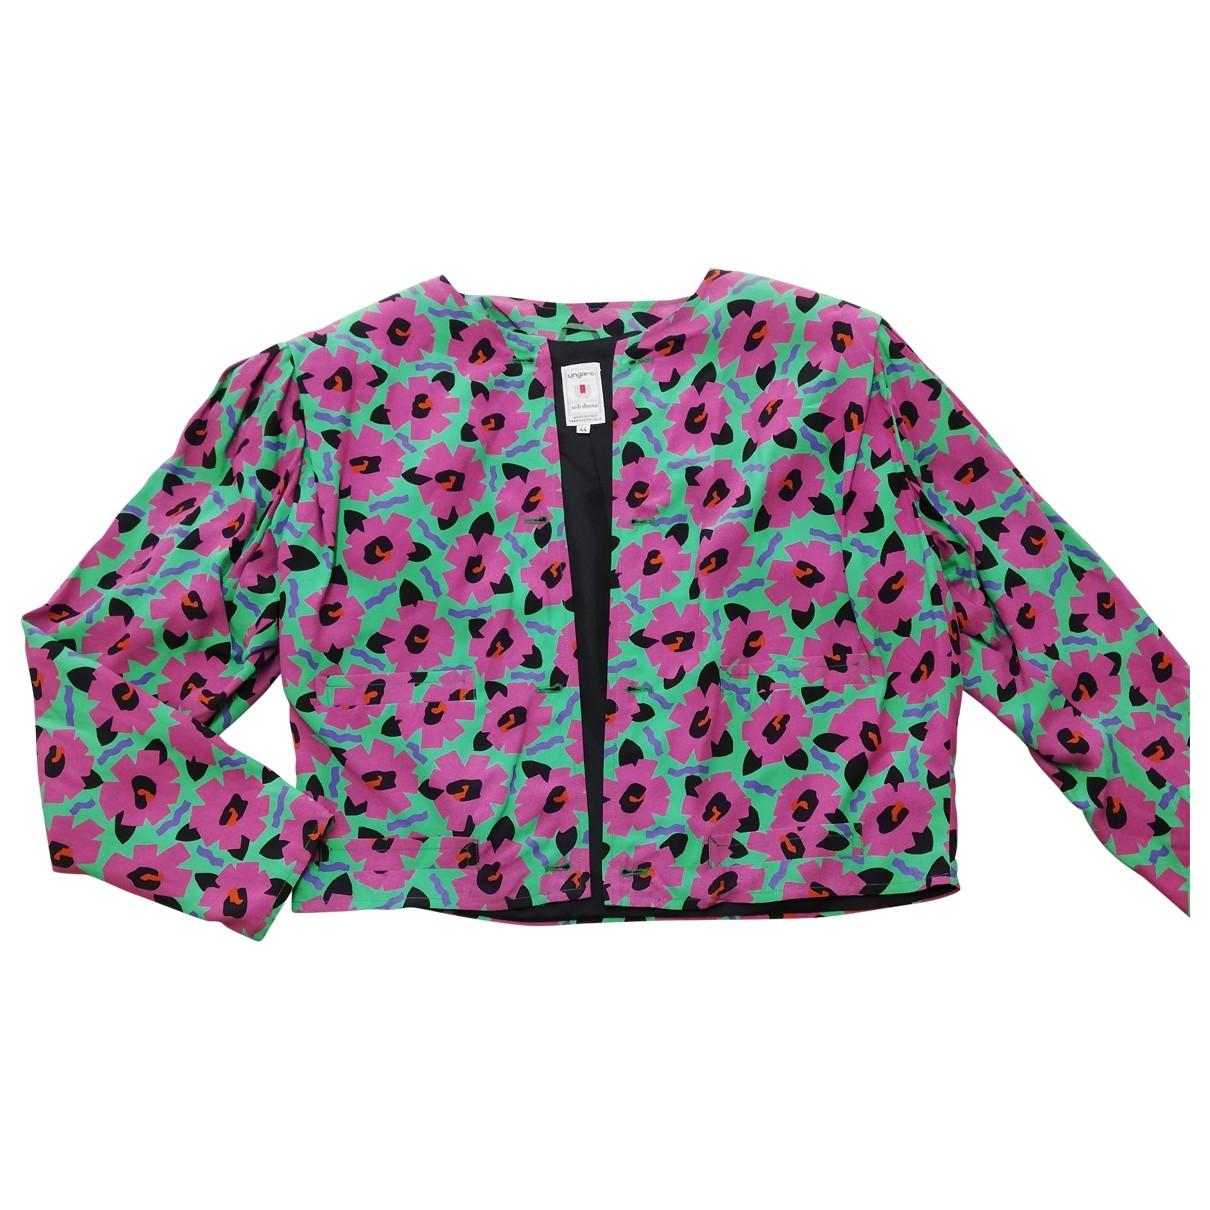 Emanuel Ungaro \N Multicolour jacket for Women 44 IT